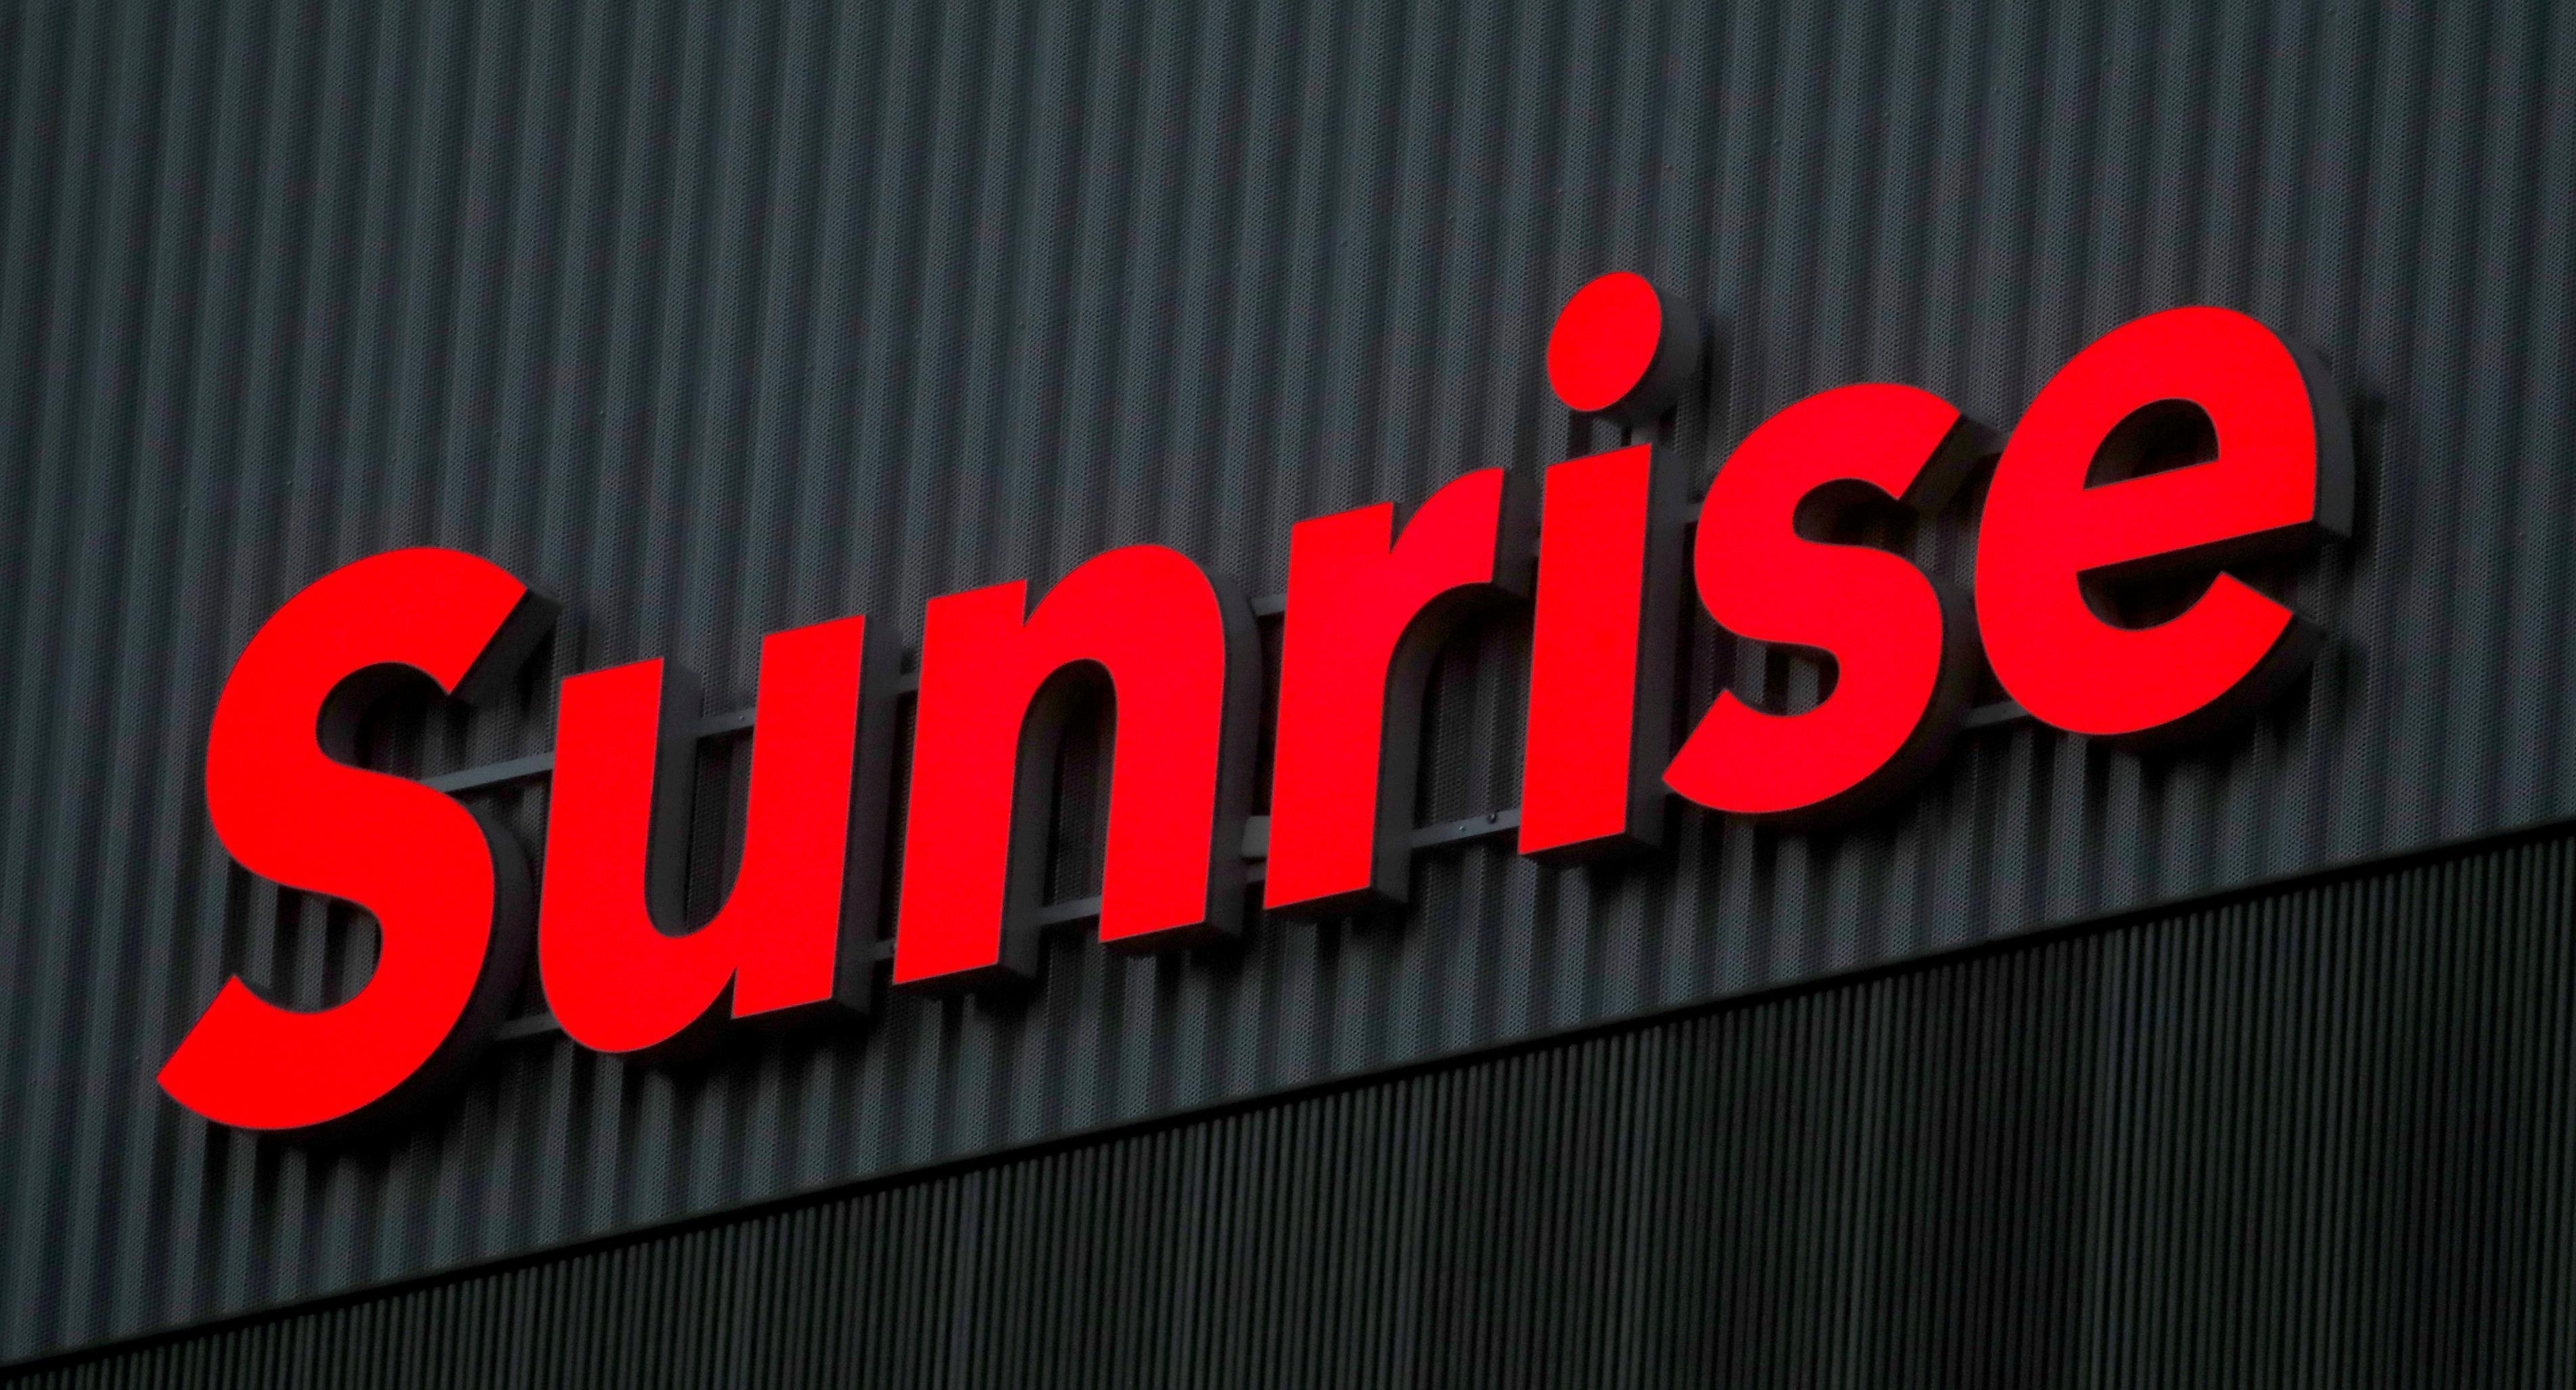 Liberty Global backs Sunrise capital hike with 500 million sfr offer